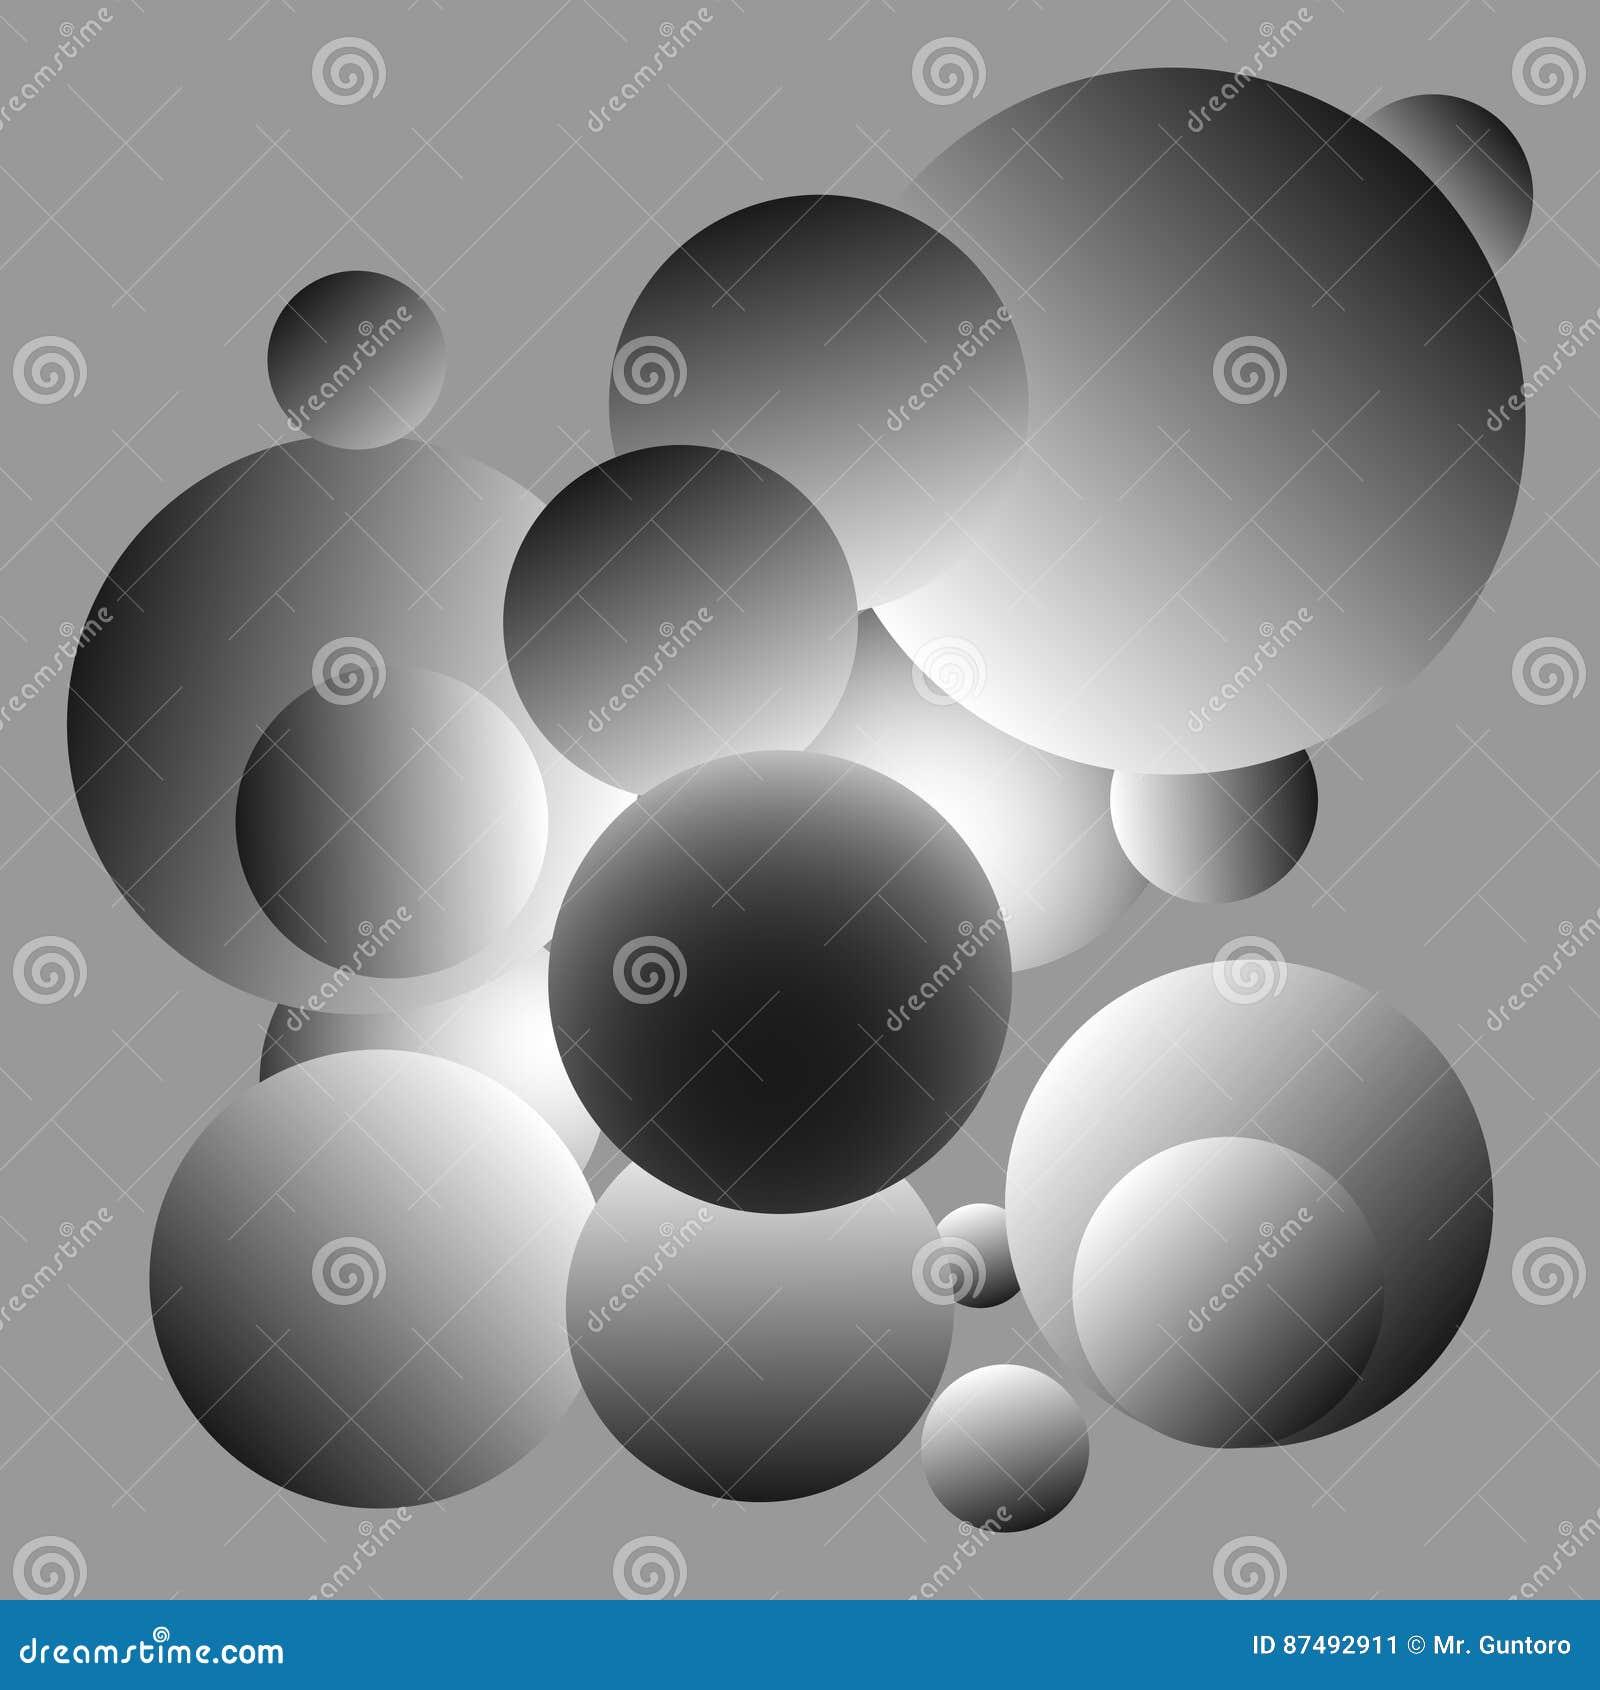 Shiny gray balls background design